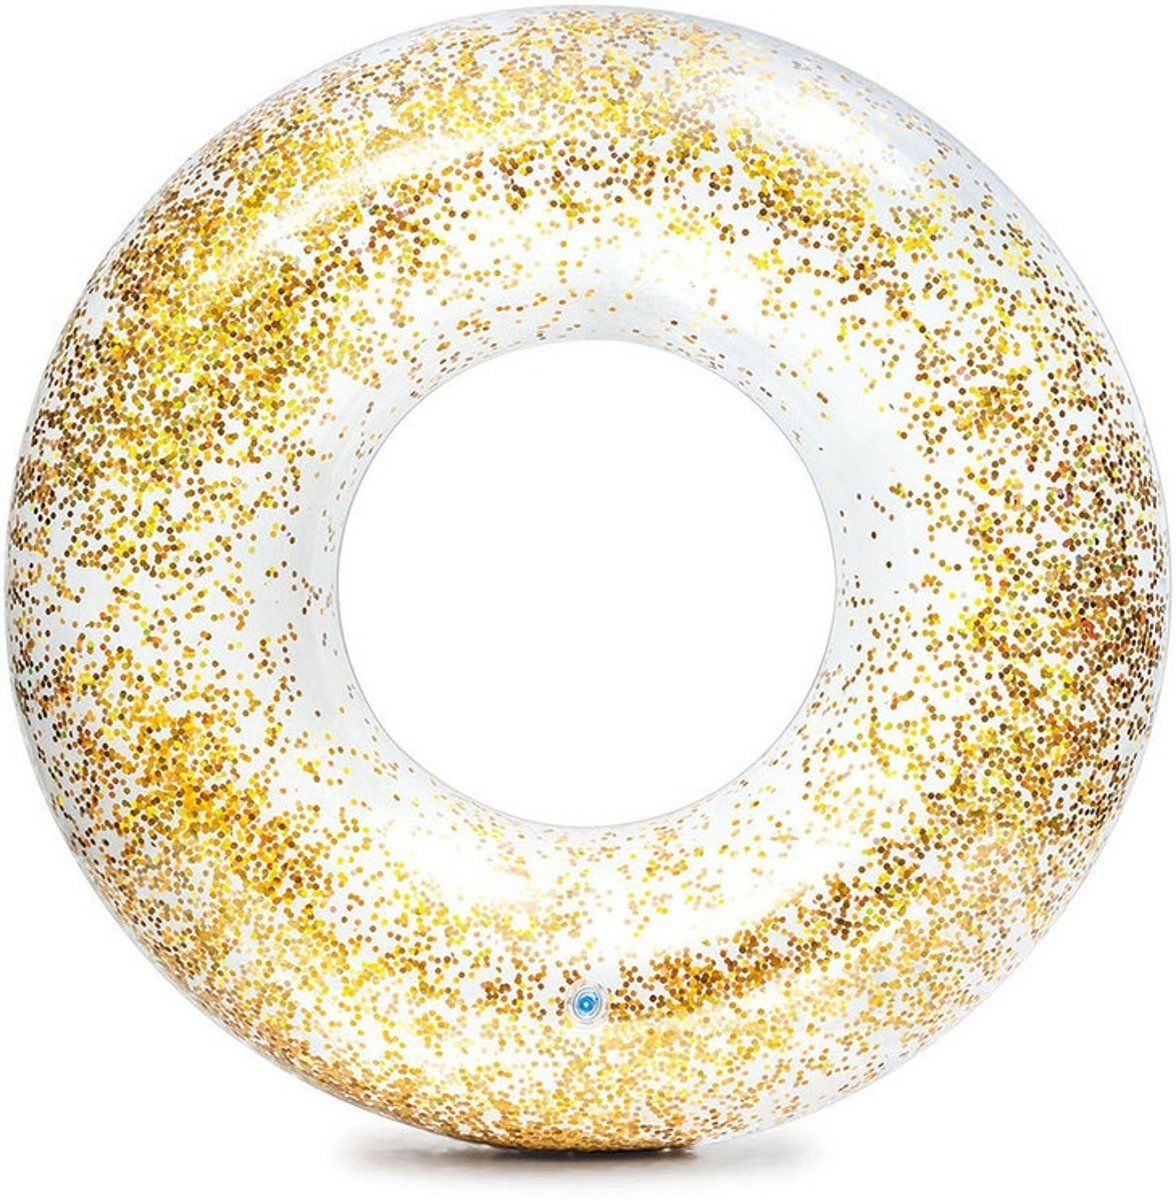 Intex Transparant Glitter Tube 119 cm - Kleur Roze of Goud - 1 Drijfband